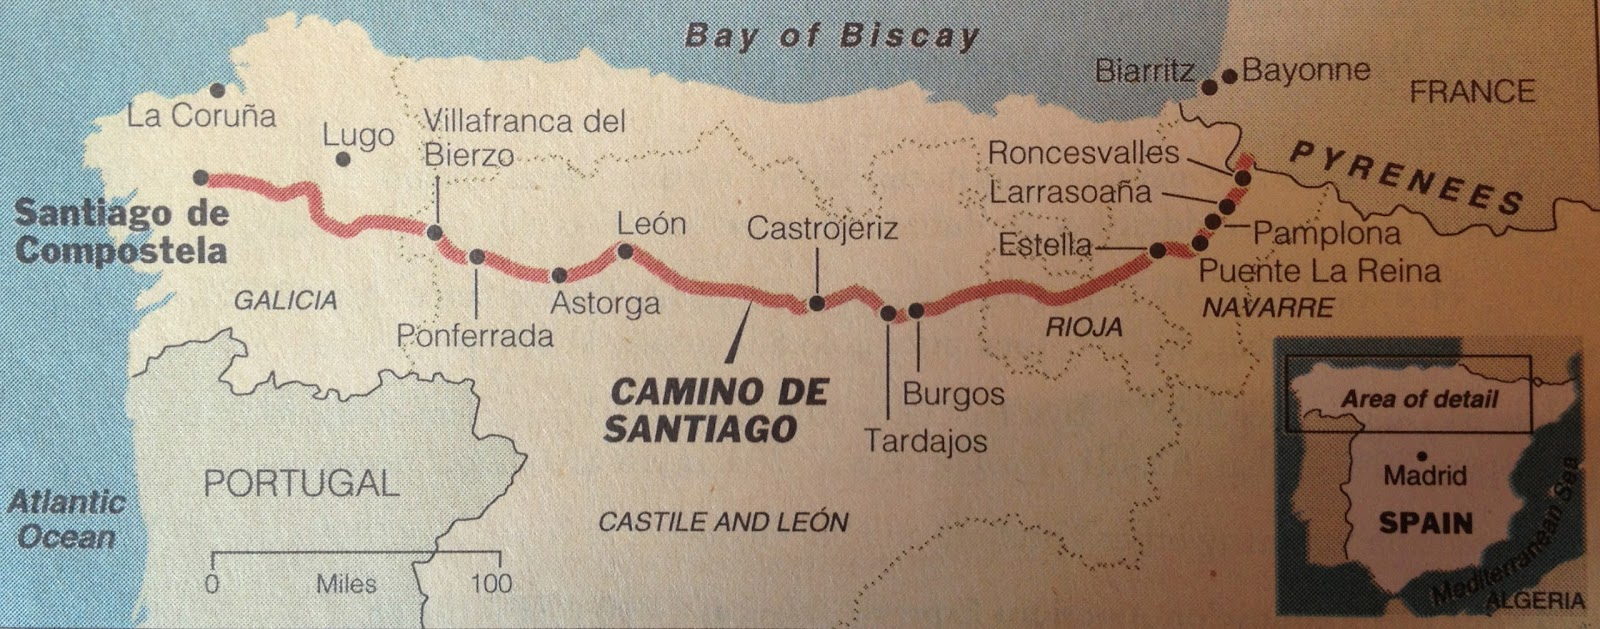 El camino de santiago time for a long walk preparation - St jean pied de port to santiago distance ...